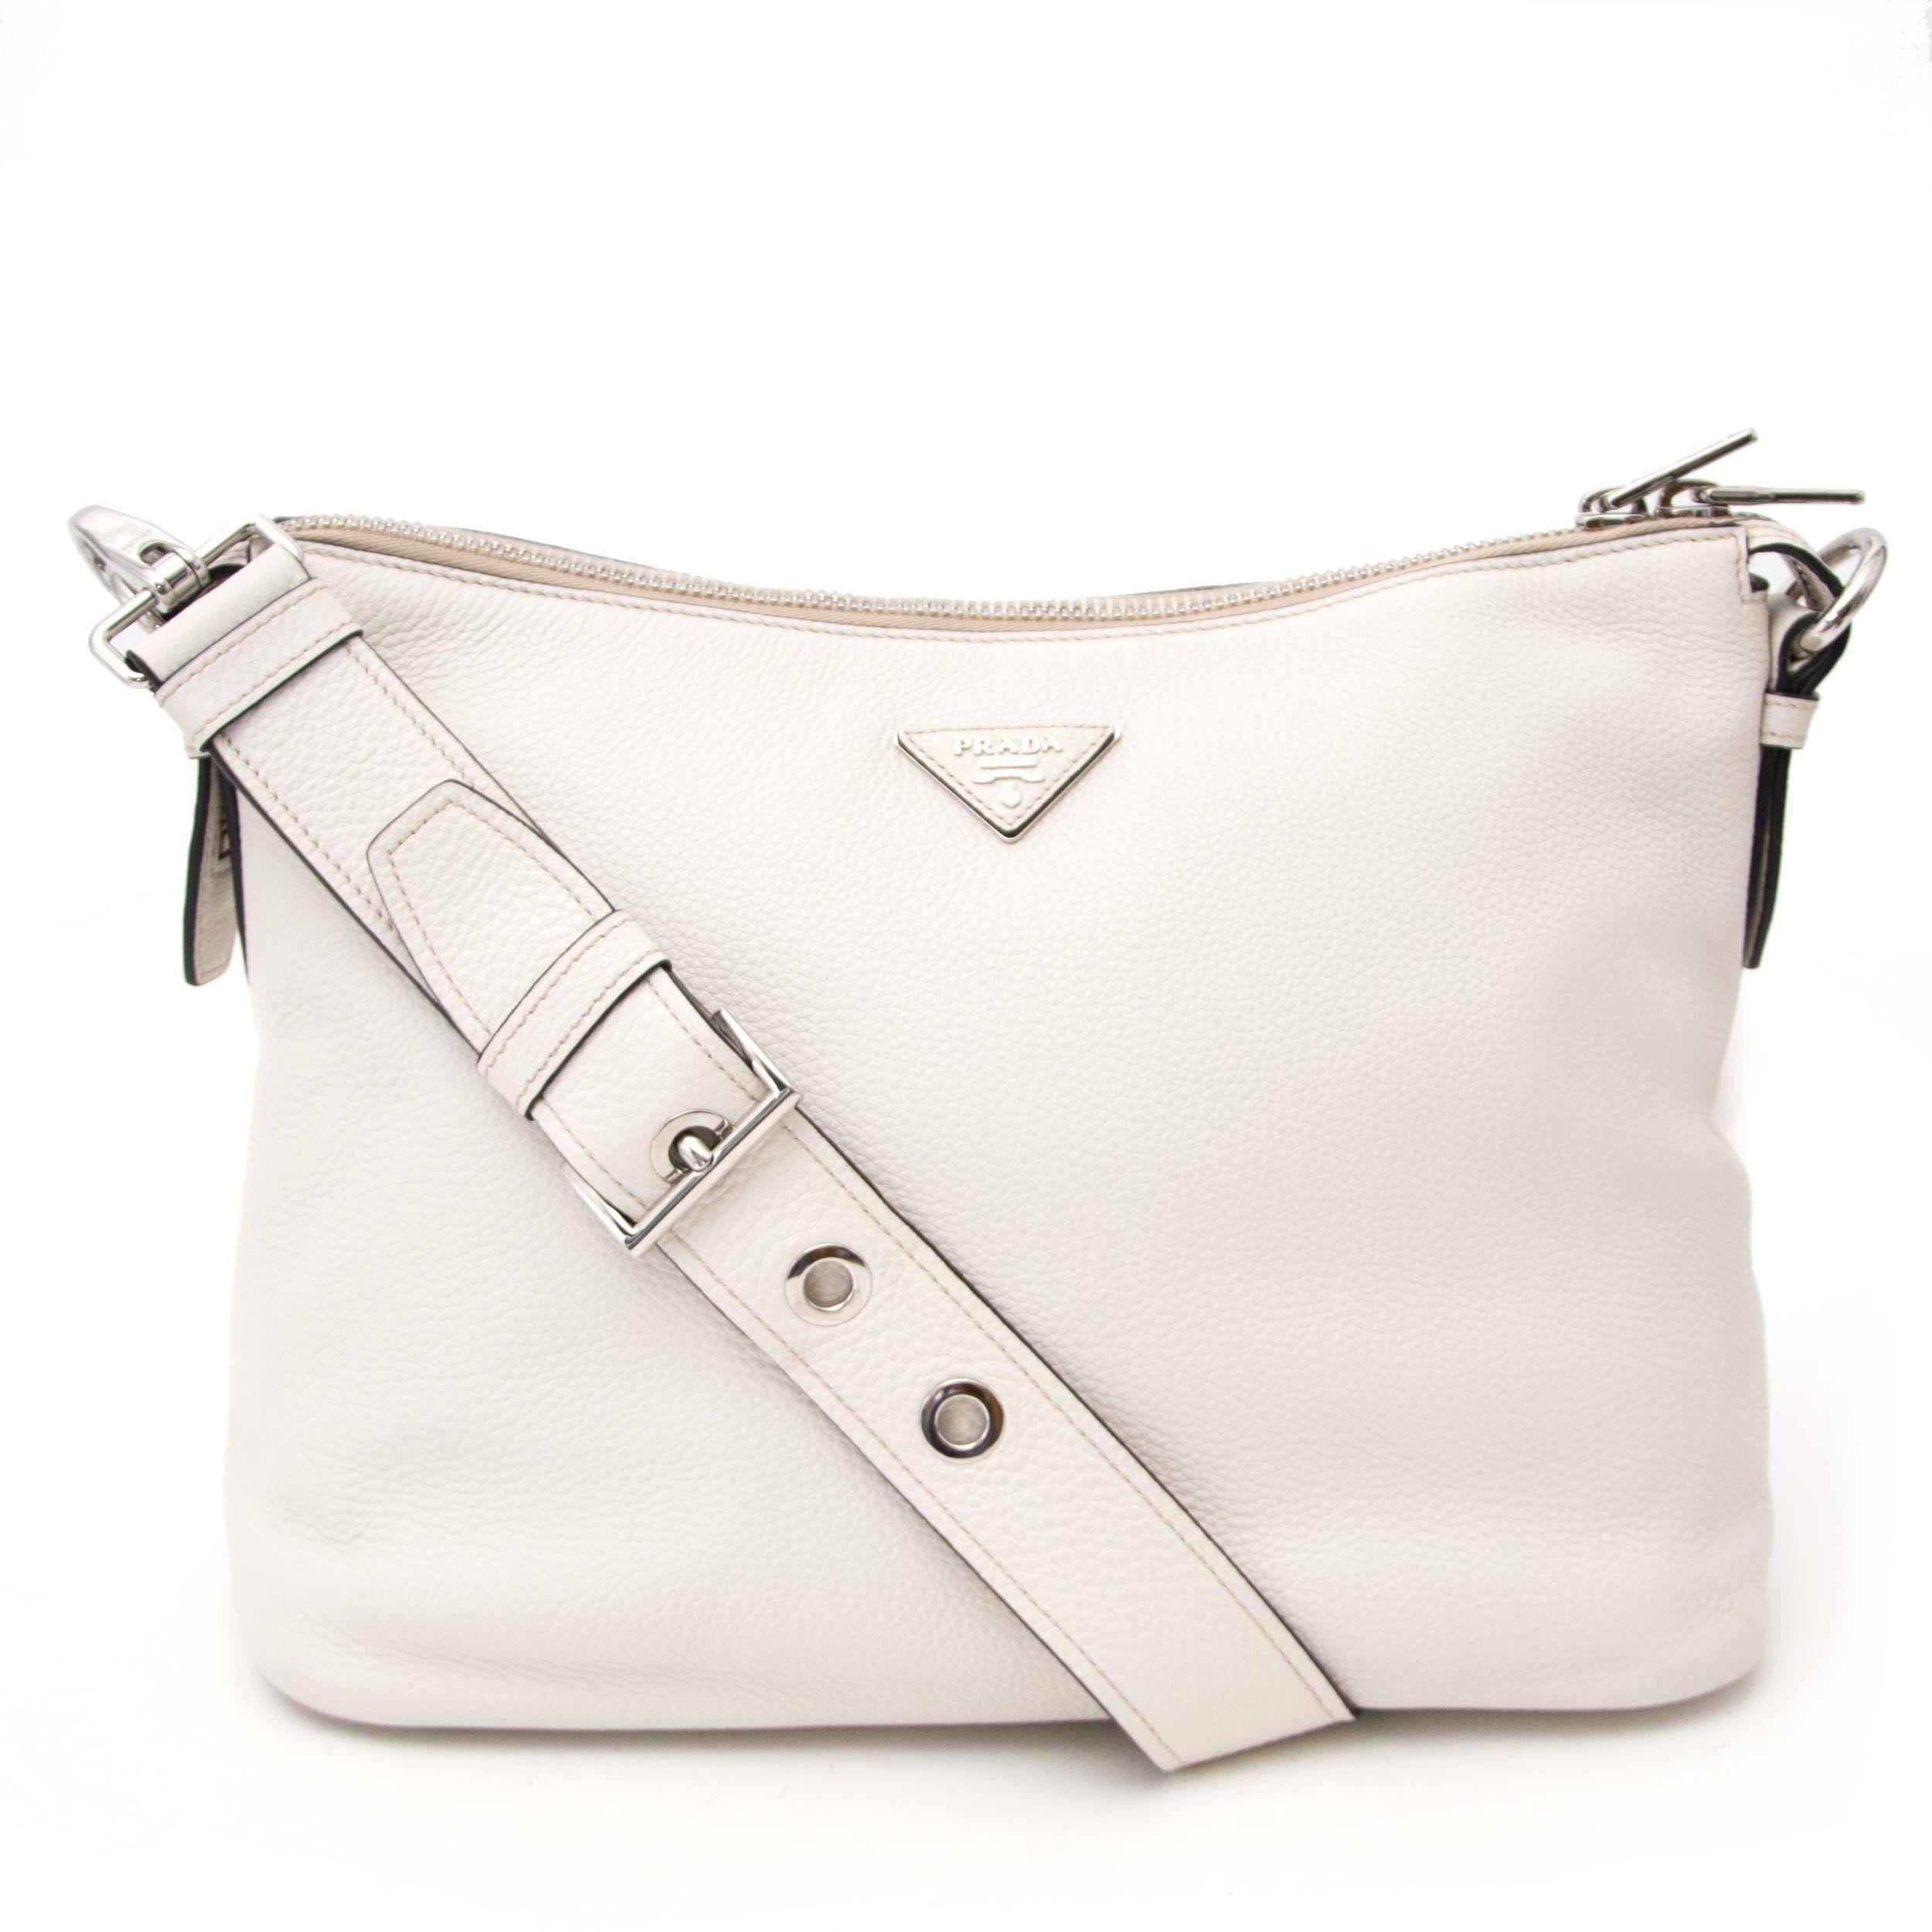 a430c59e85e4 Prada White Leather Shoulder Bag | We LOV Prada in 2019 | Leather ...